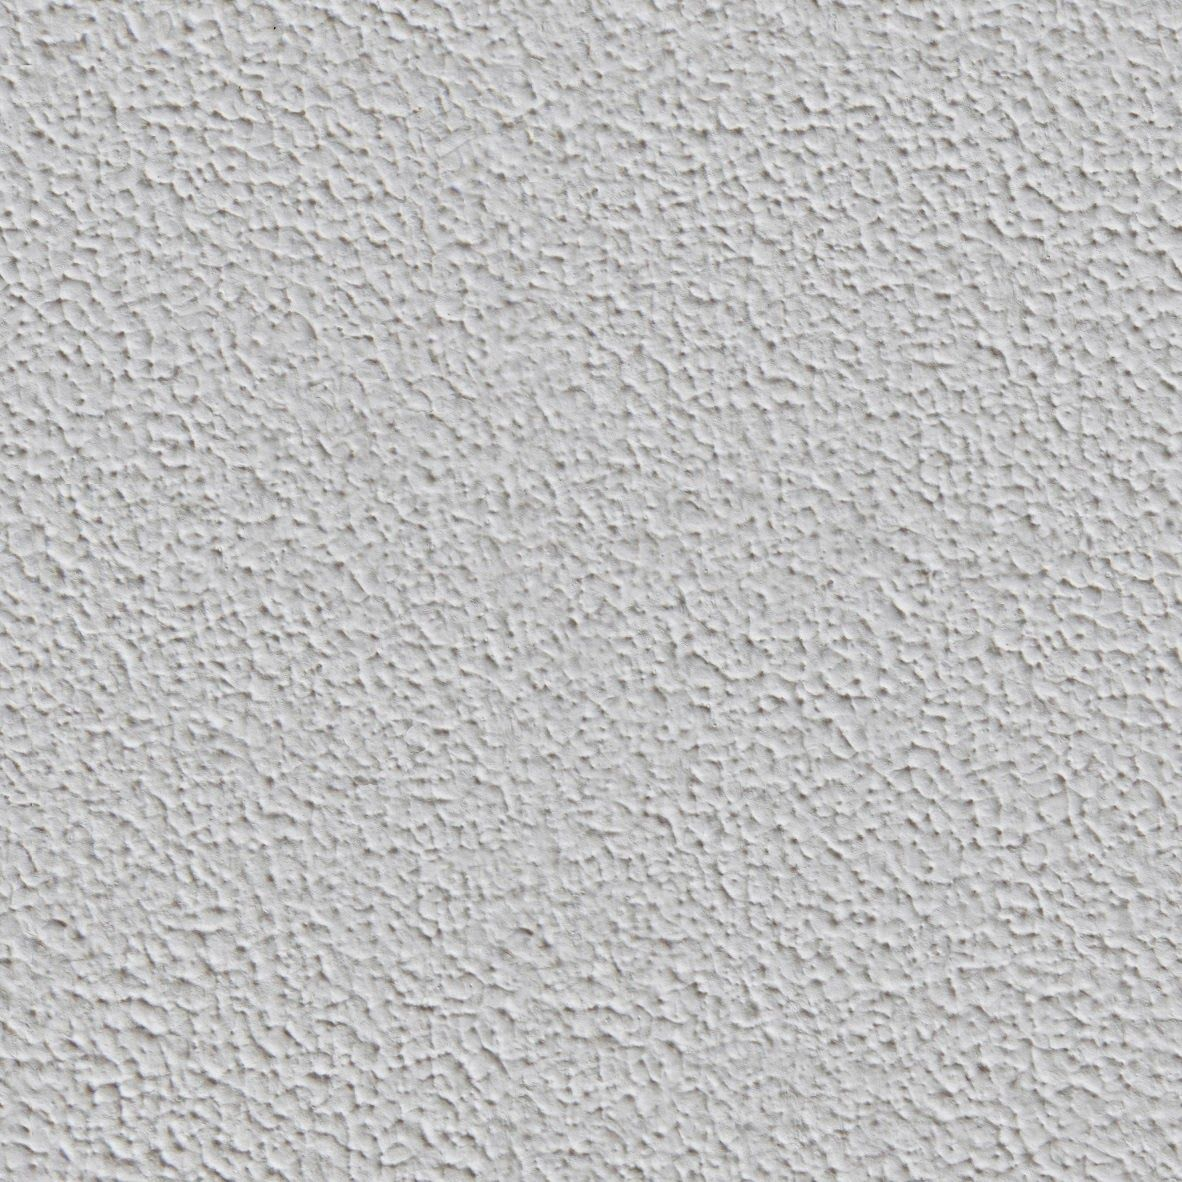 Pin By Jaime Aguilar On Stucco Texture: TEXTURE SEAMLESS - BUCCIATO